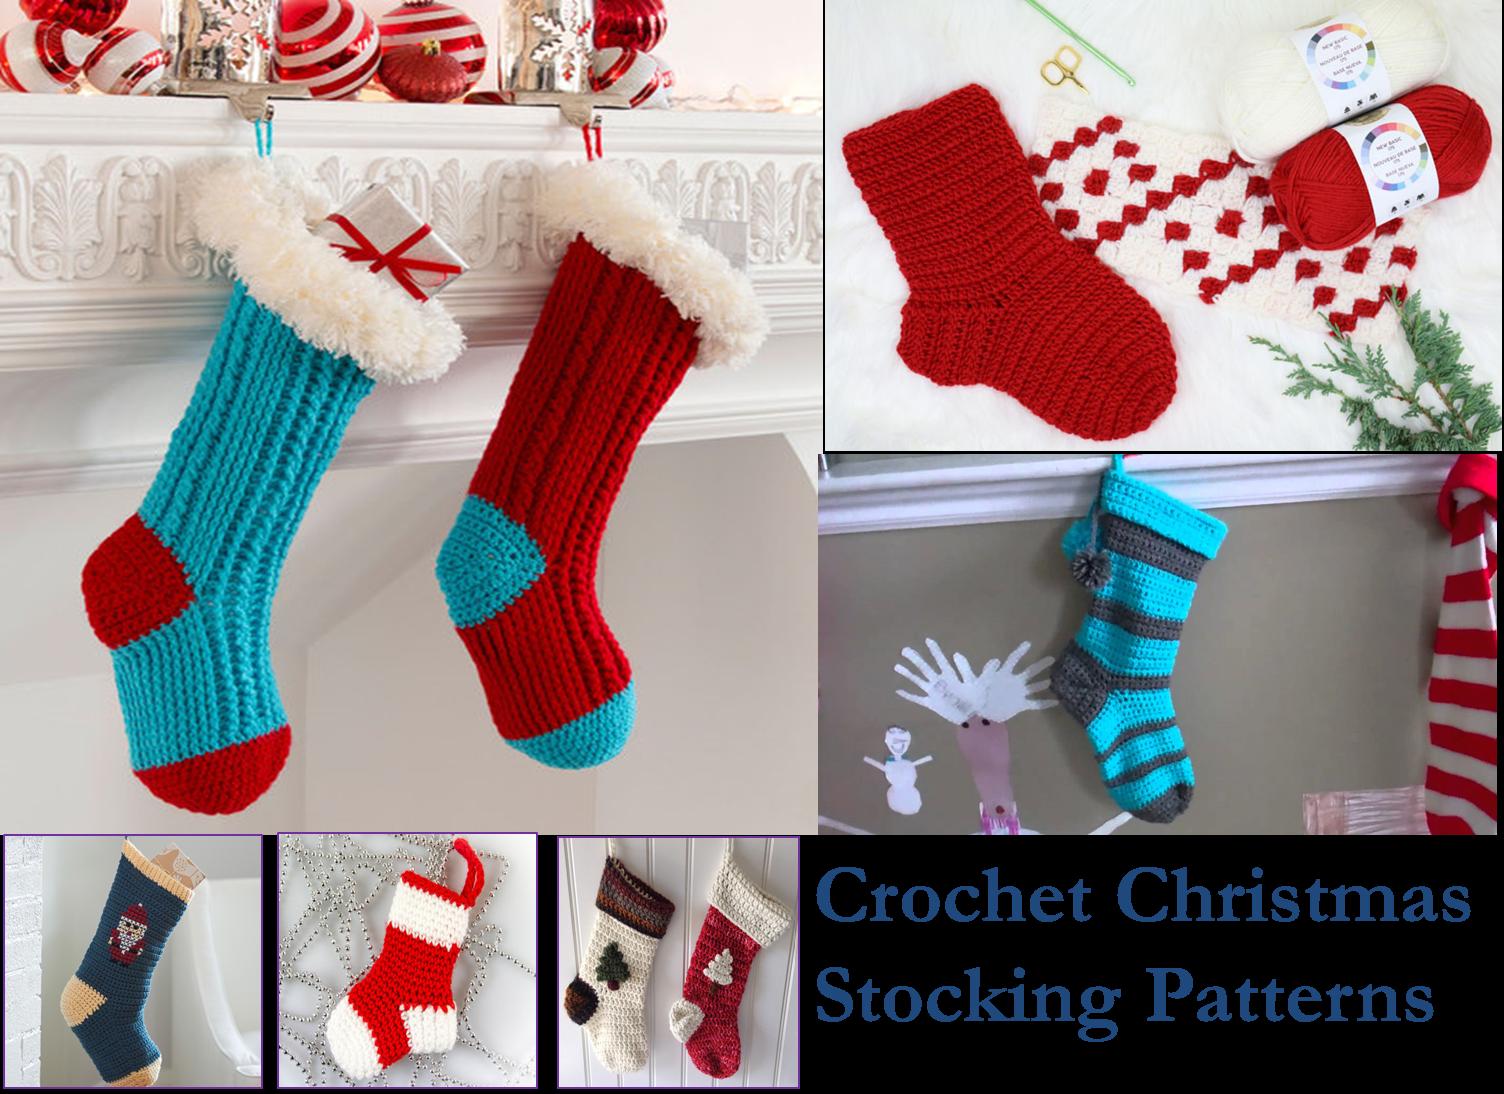 Crochet Christmas Stocking Pattern.40 Crochet Christmas Stocking Patterns The Funky Stitch